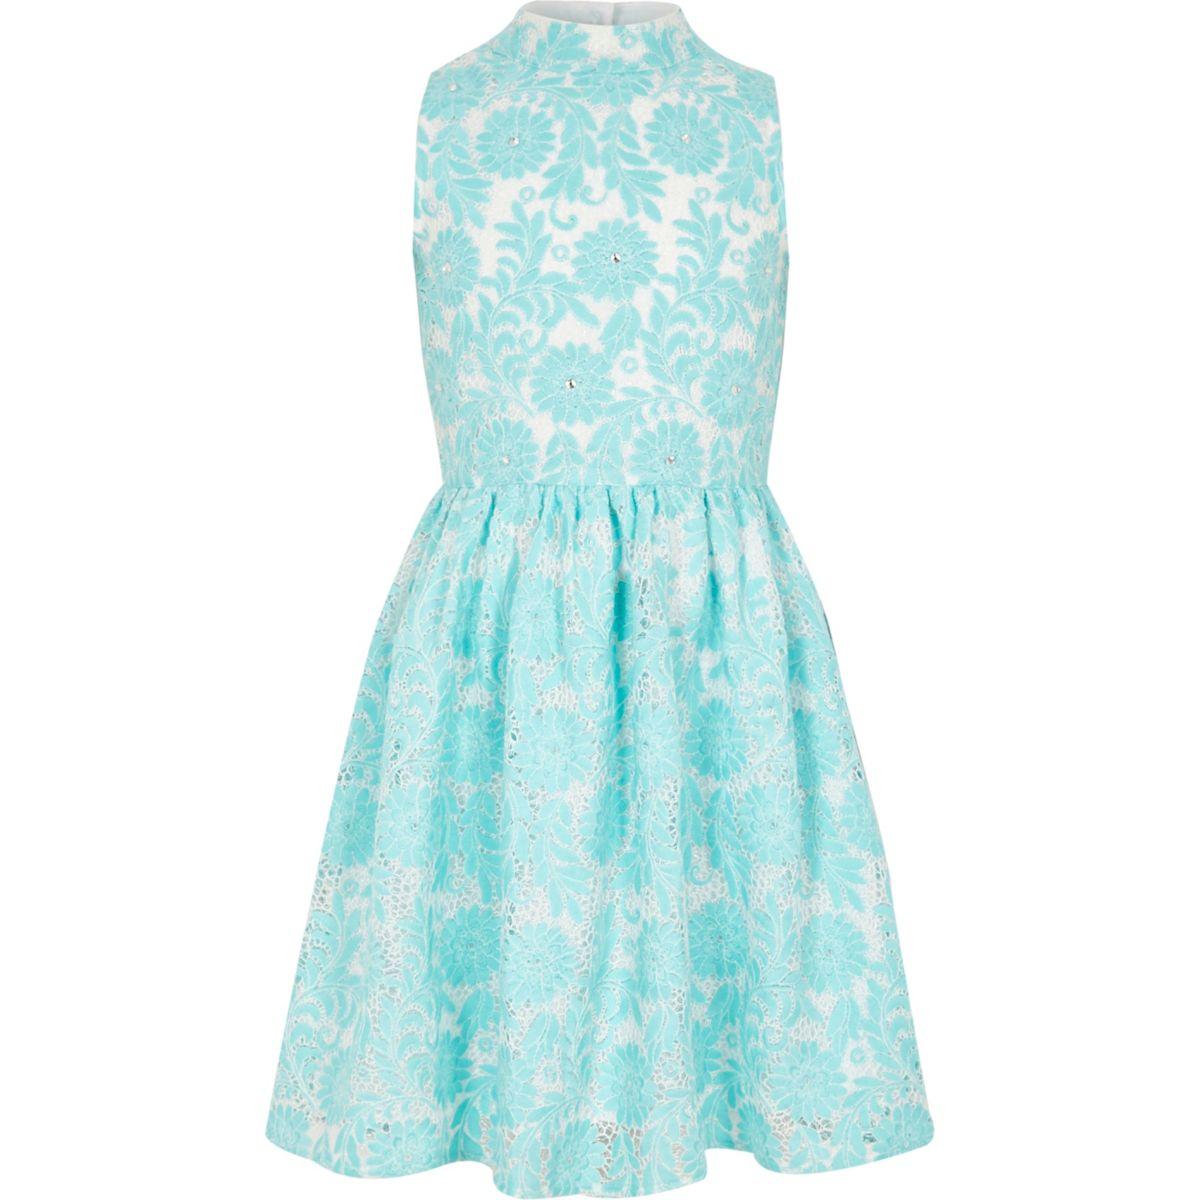 Girls blue lace high neck prom dress